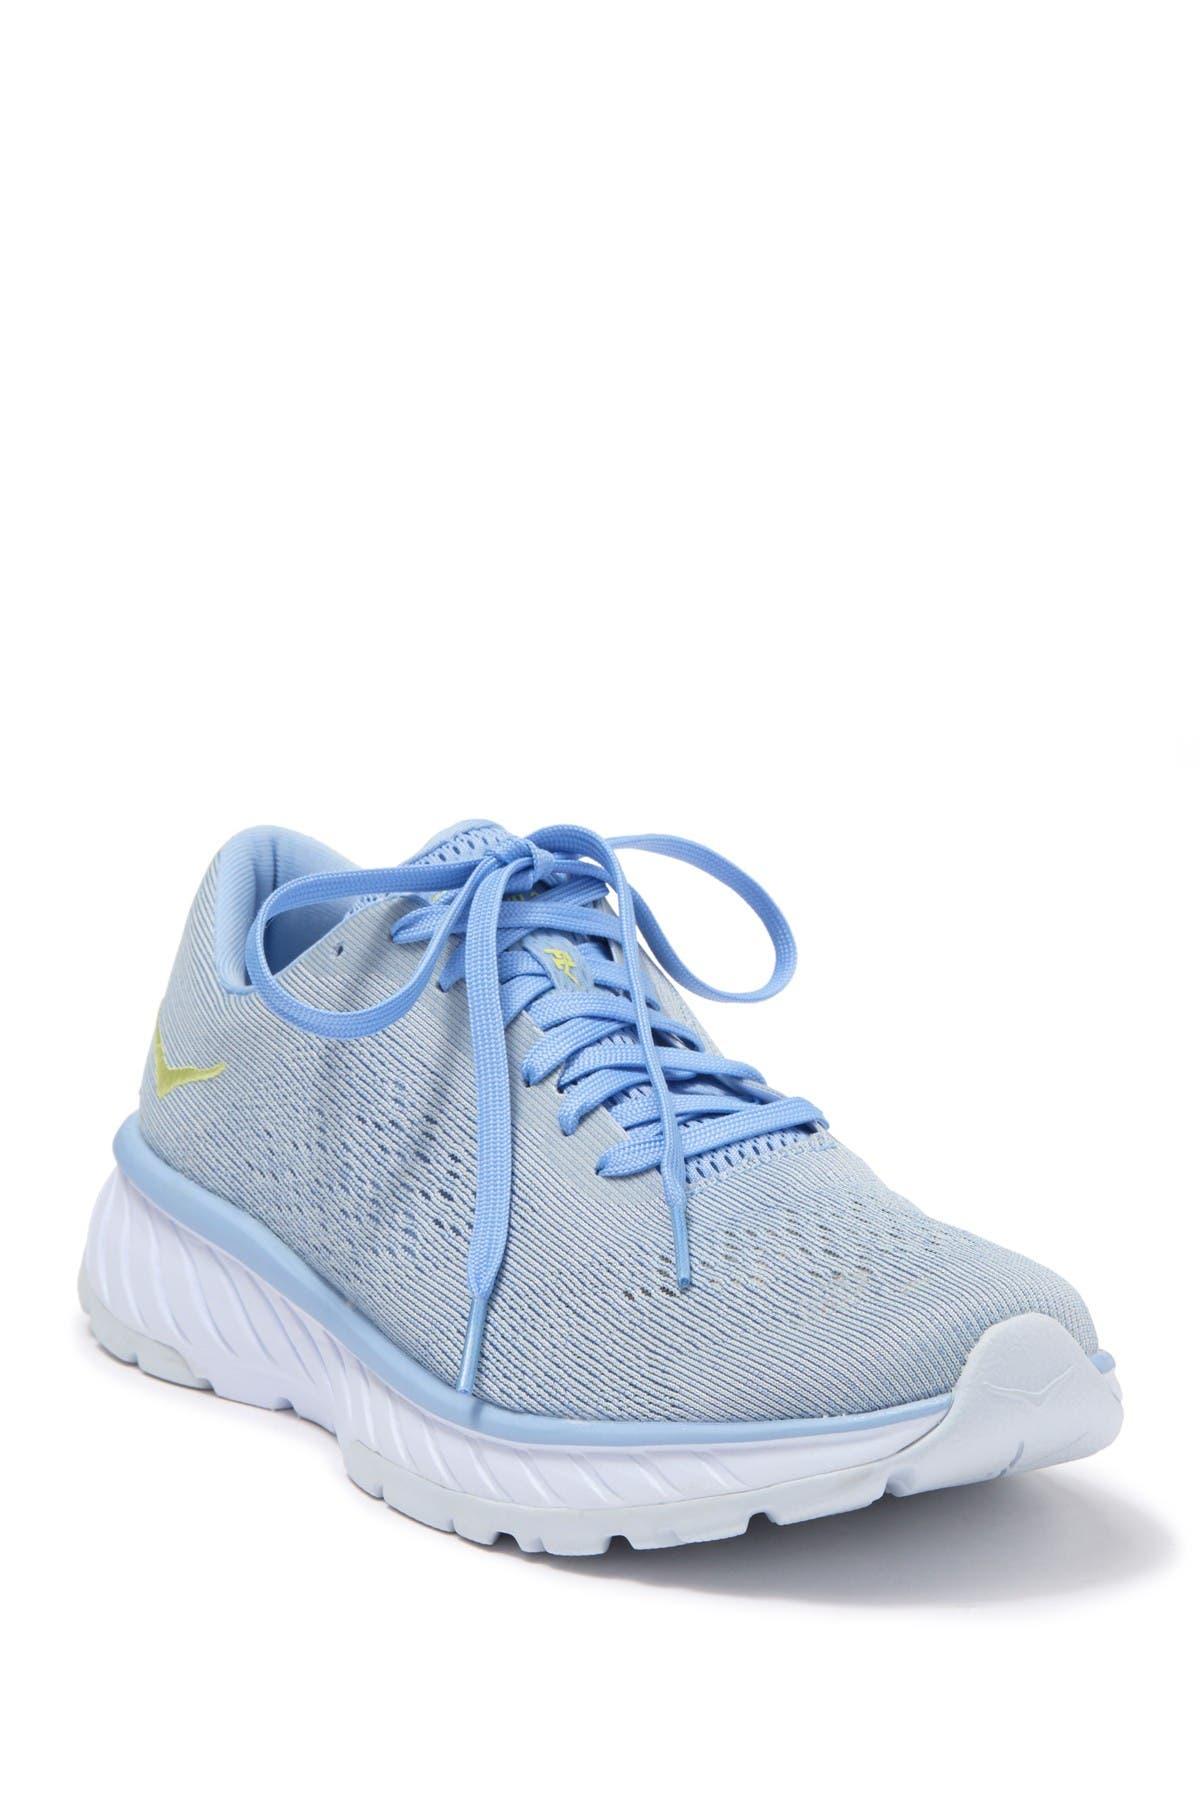 HOKA ONE ONE | Cavu 2 Marl Running Shoe